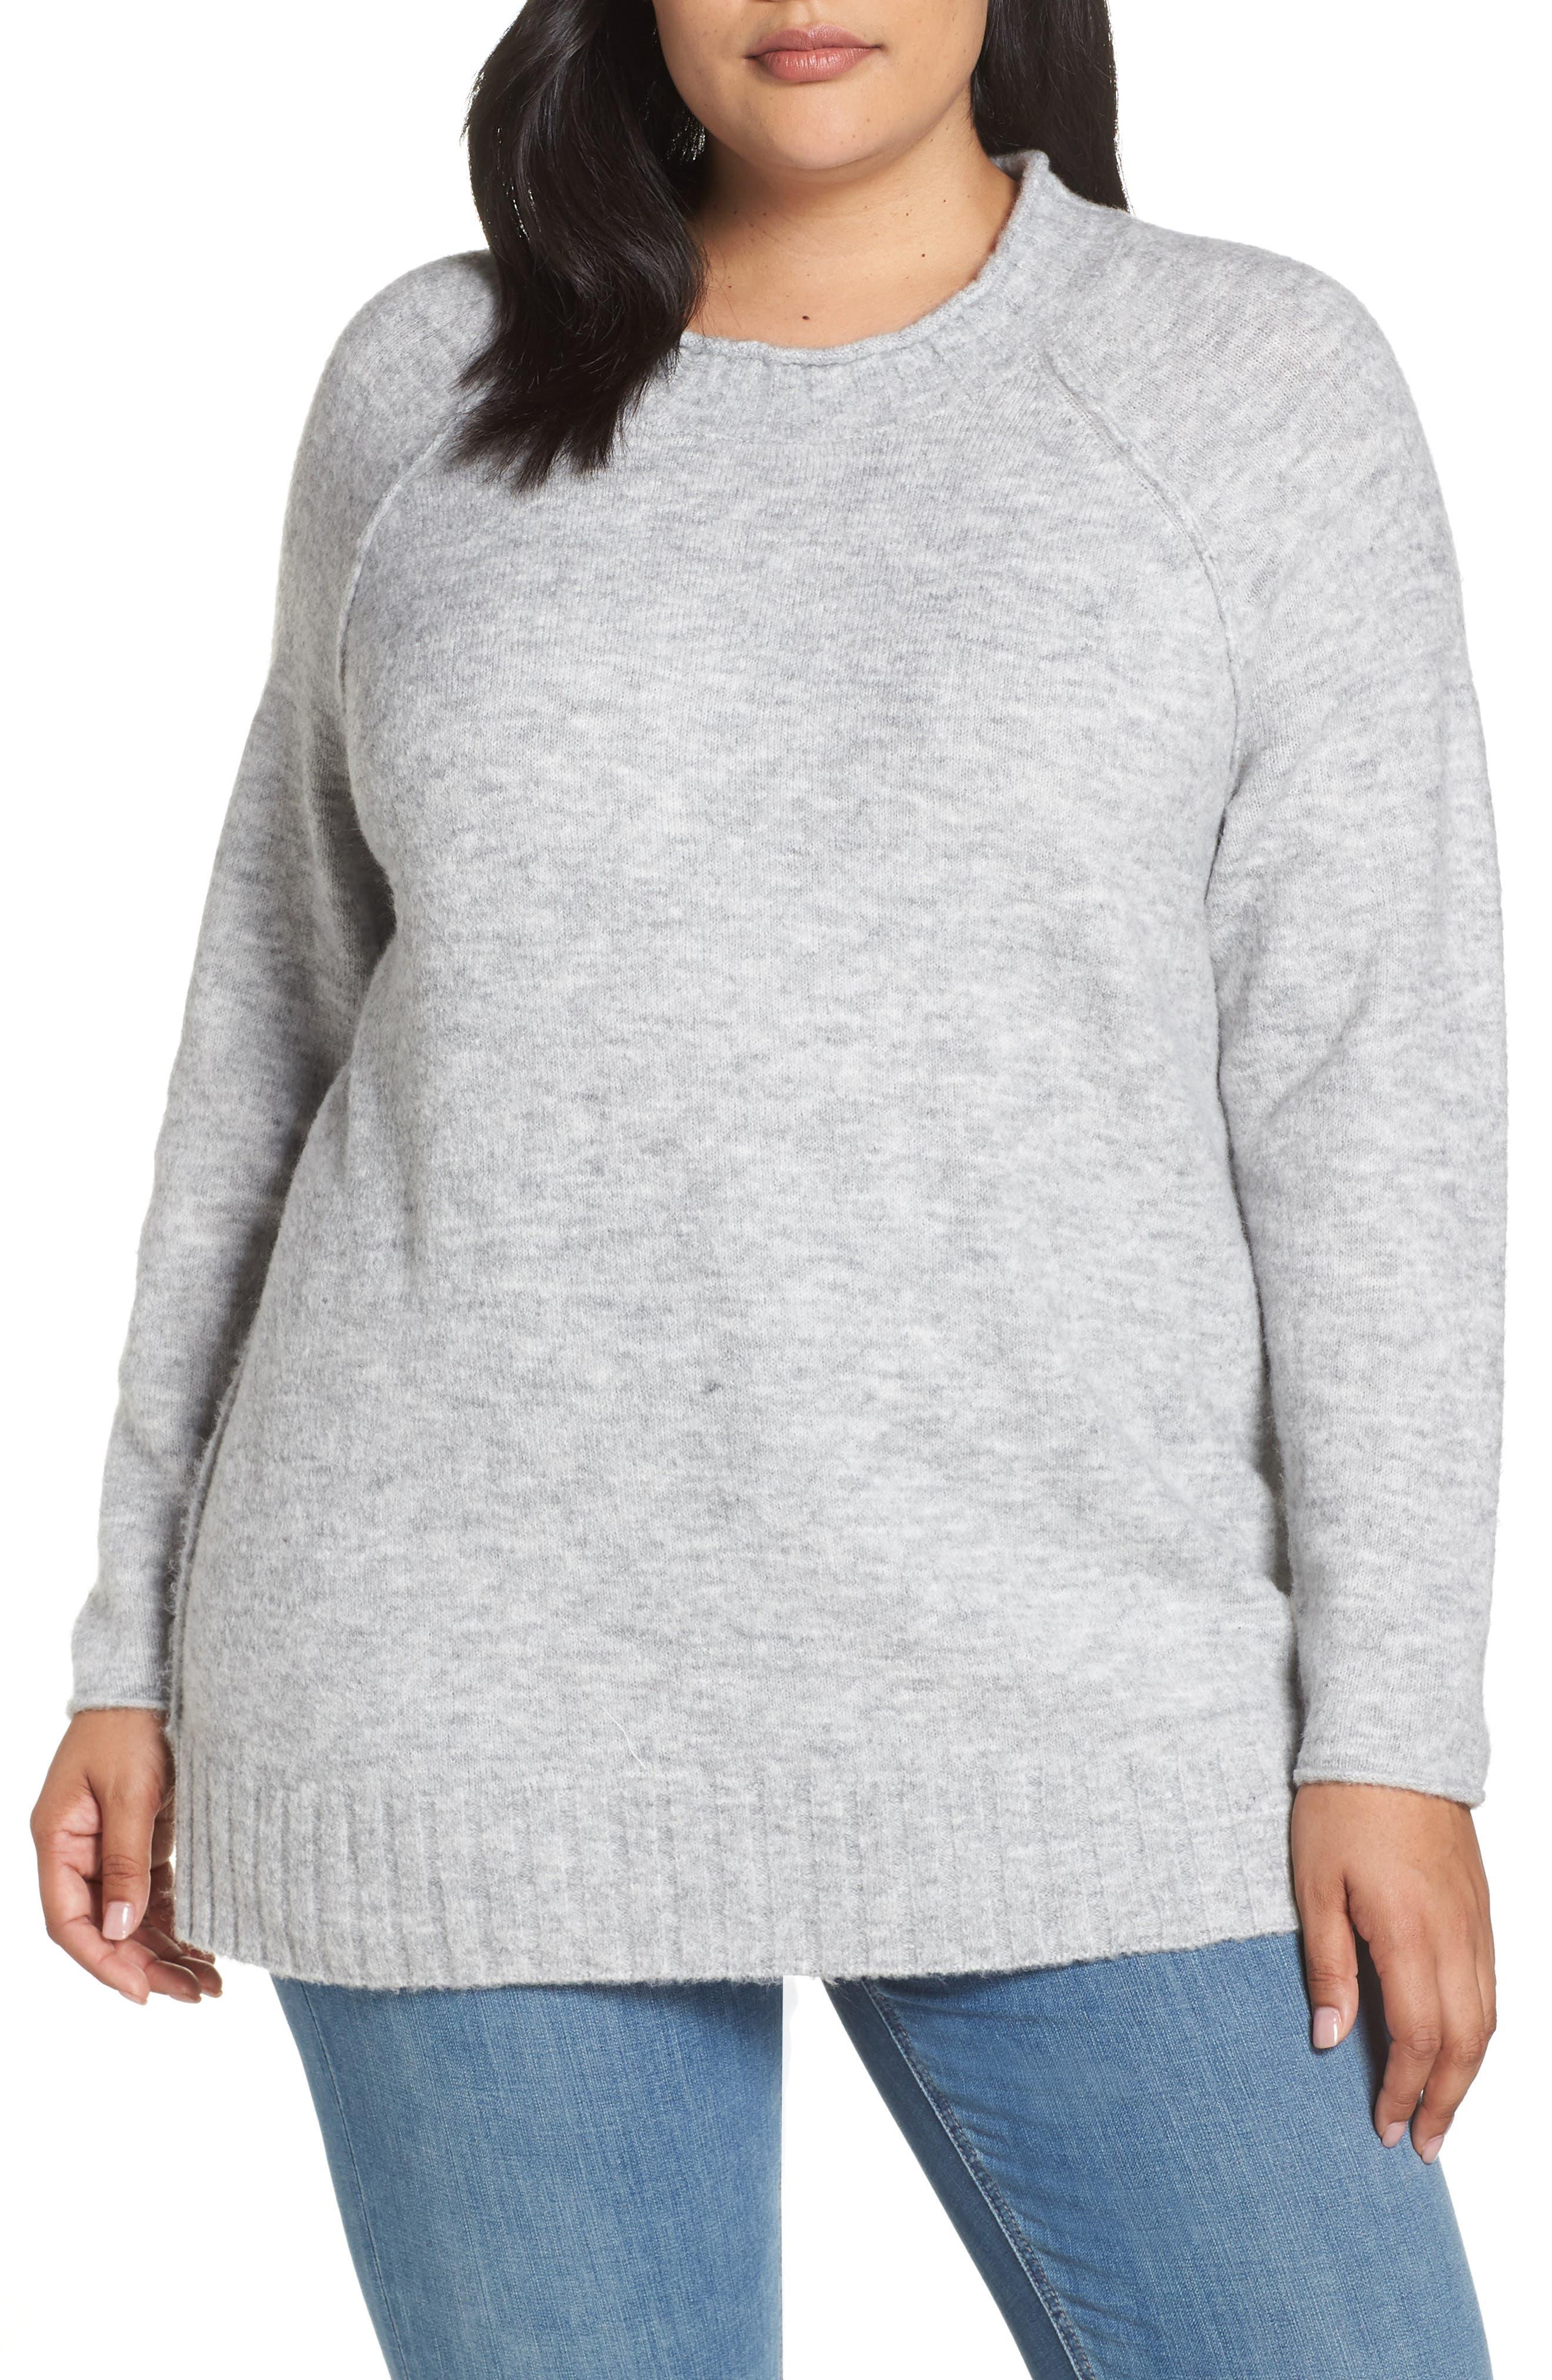 Cozy Crewneck Sweater,                             Main thumbnail 1, color,                             GREY HEATHER